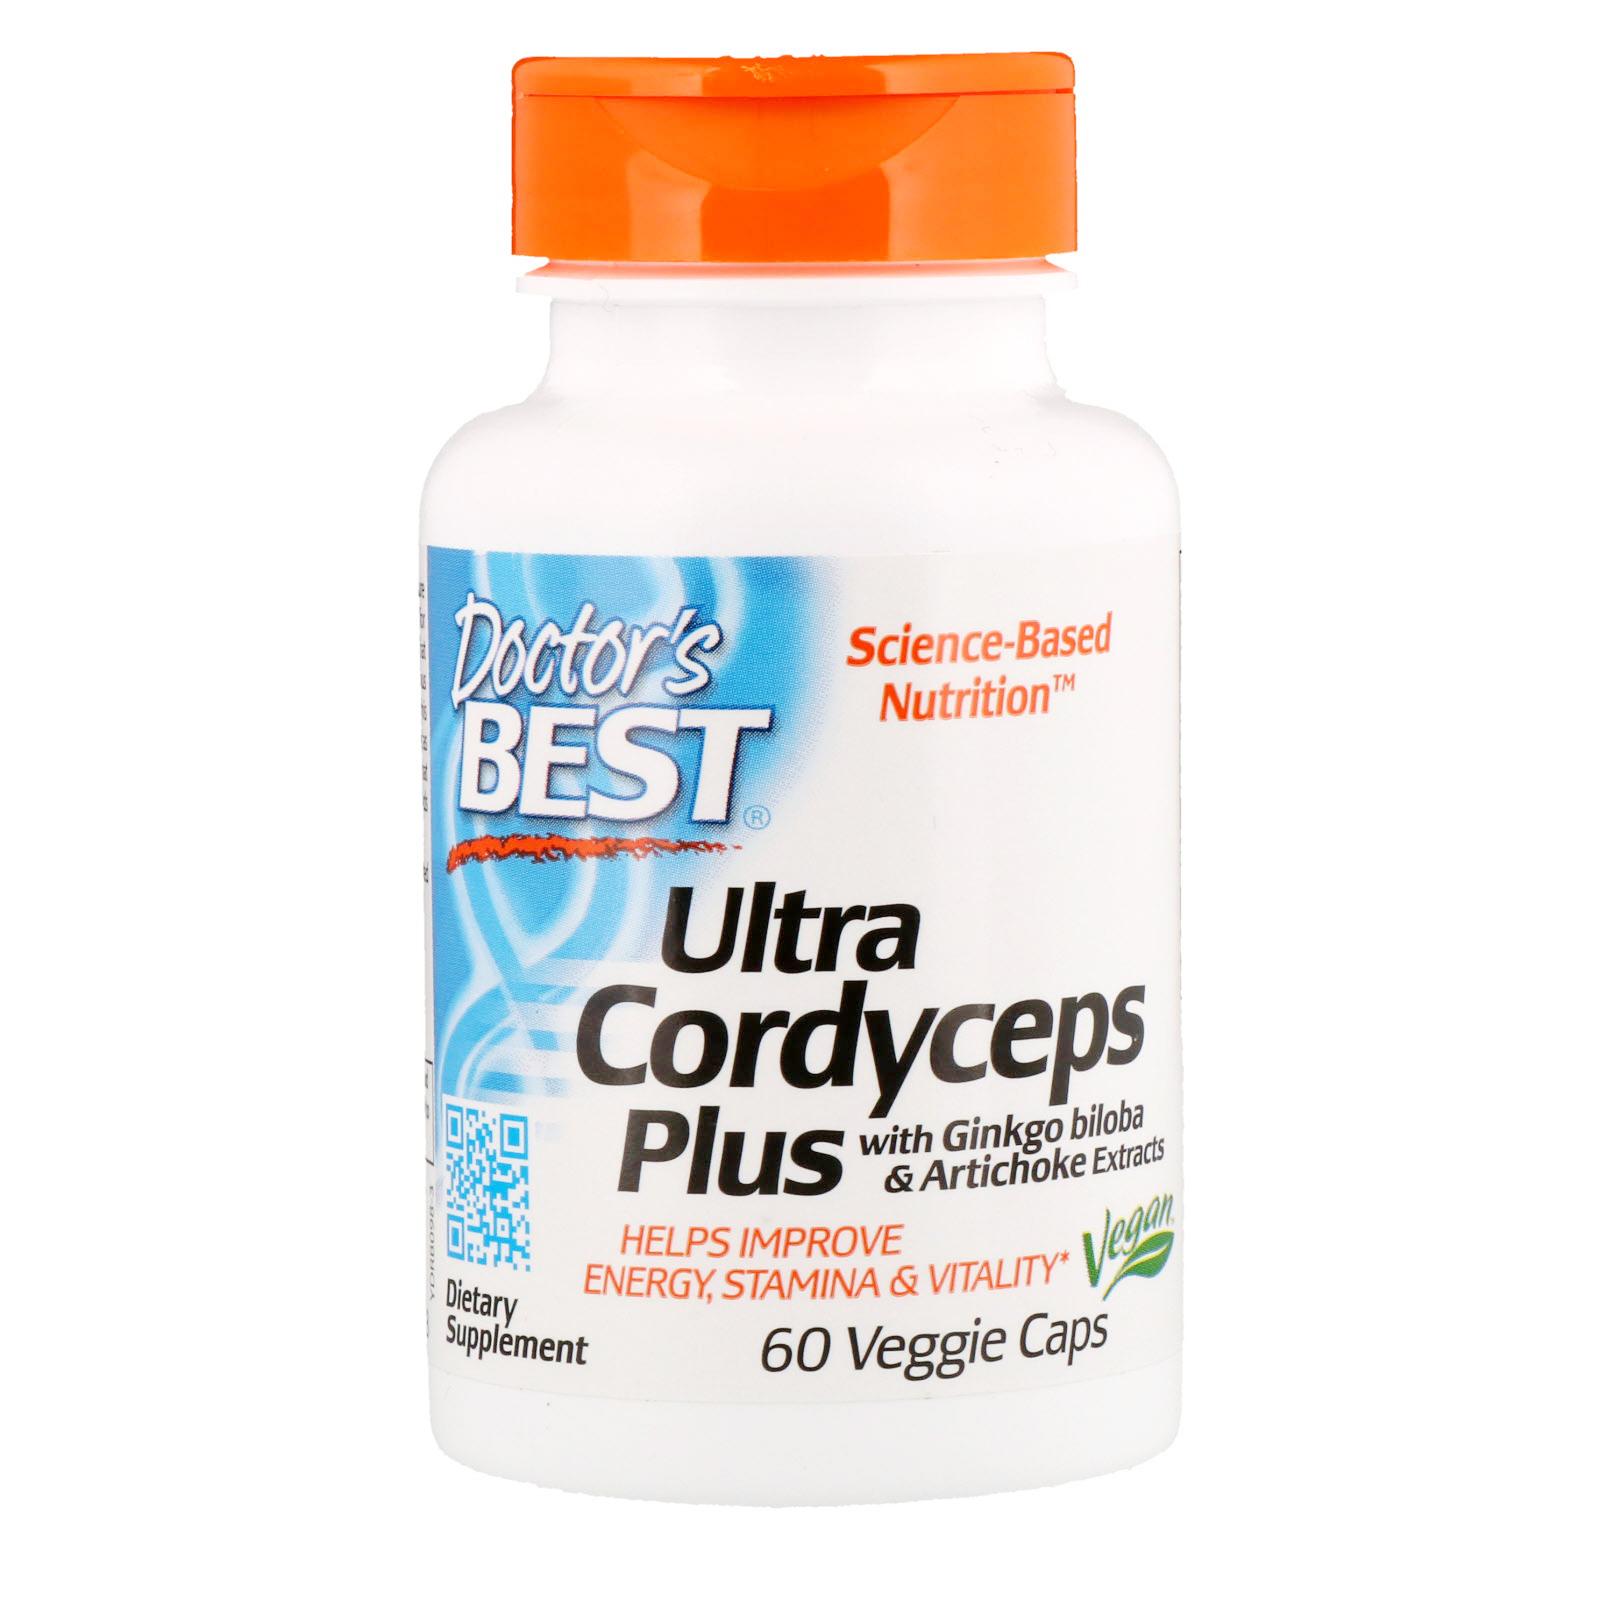 Doctor's Best Ultra Cordyceps Plus Artychoke & Ginkgo Biloba, 60 kapslí